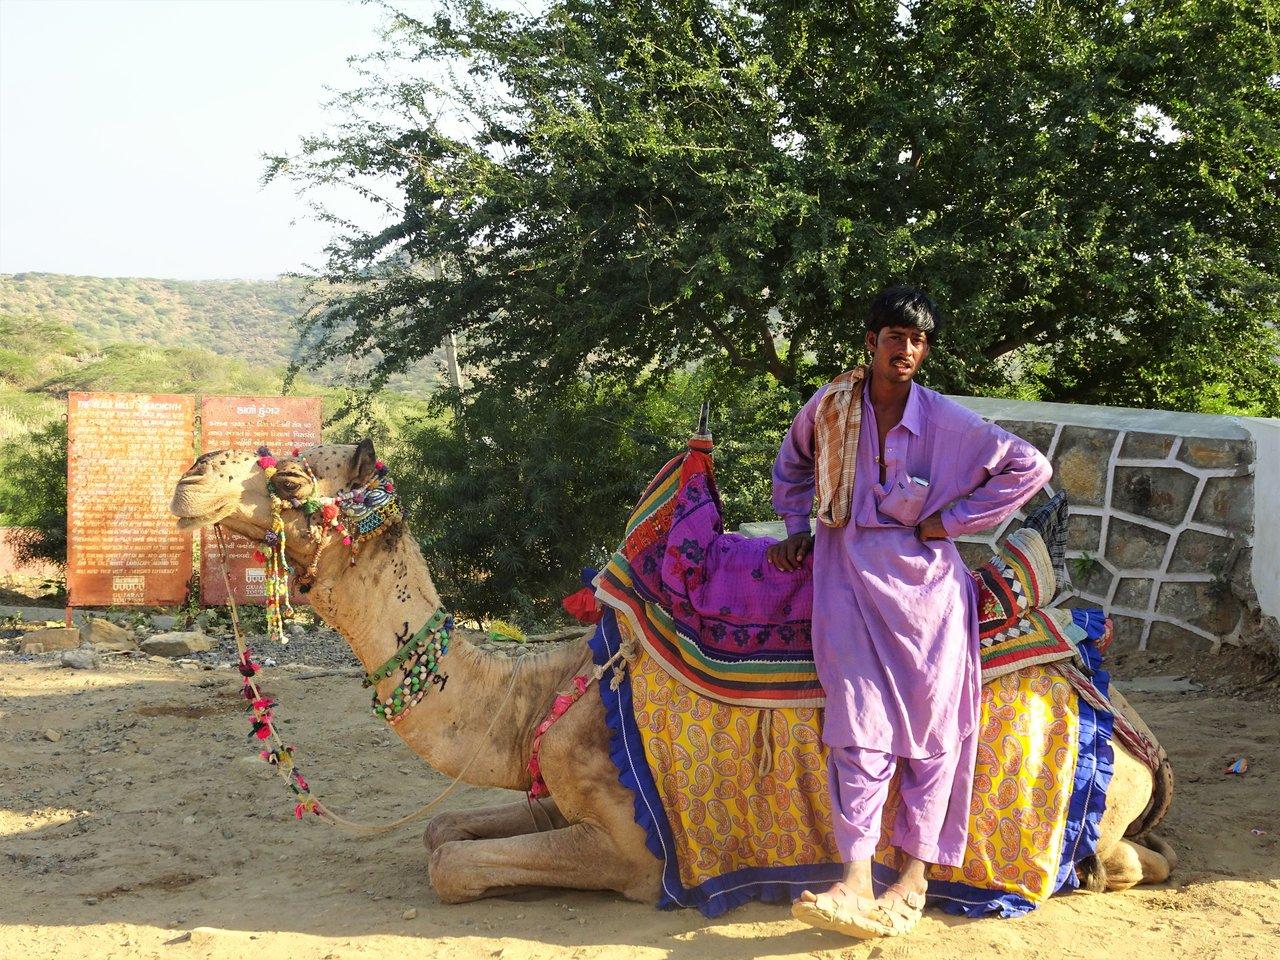 Men in Peshawari style Salwar Kameez